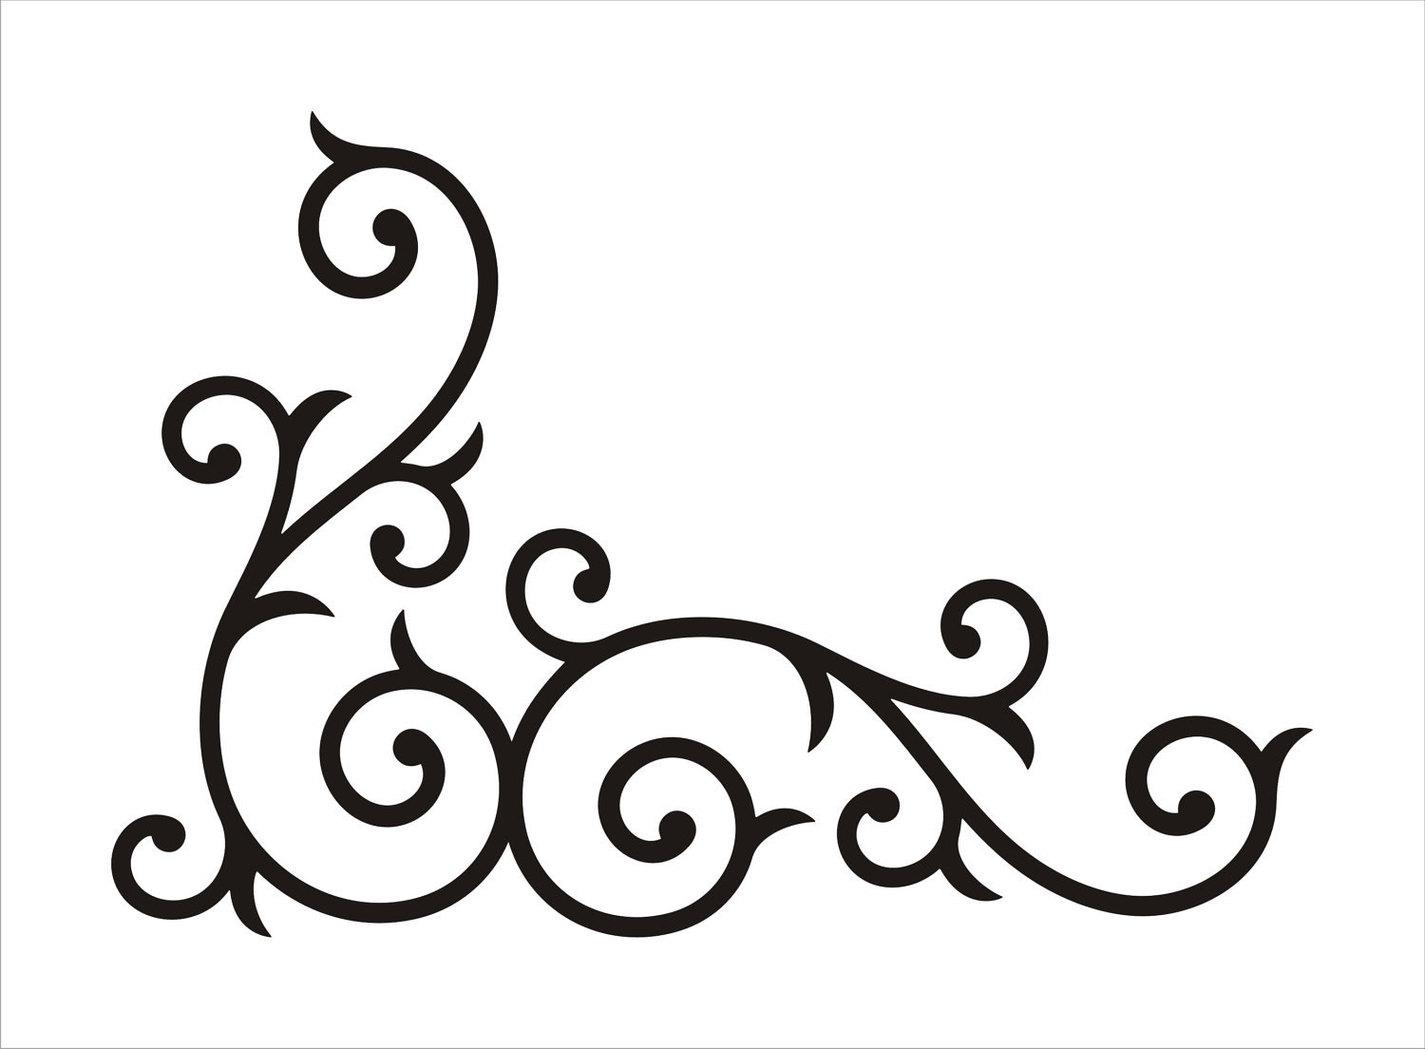 Swirl corner clipart clipart .-Swirl corner clipart clipart .-5